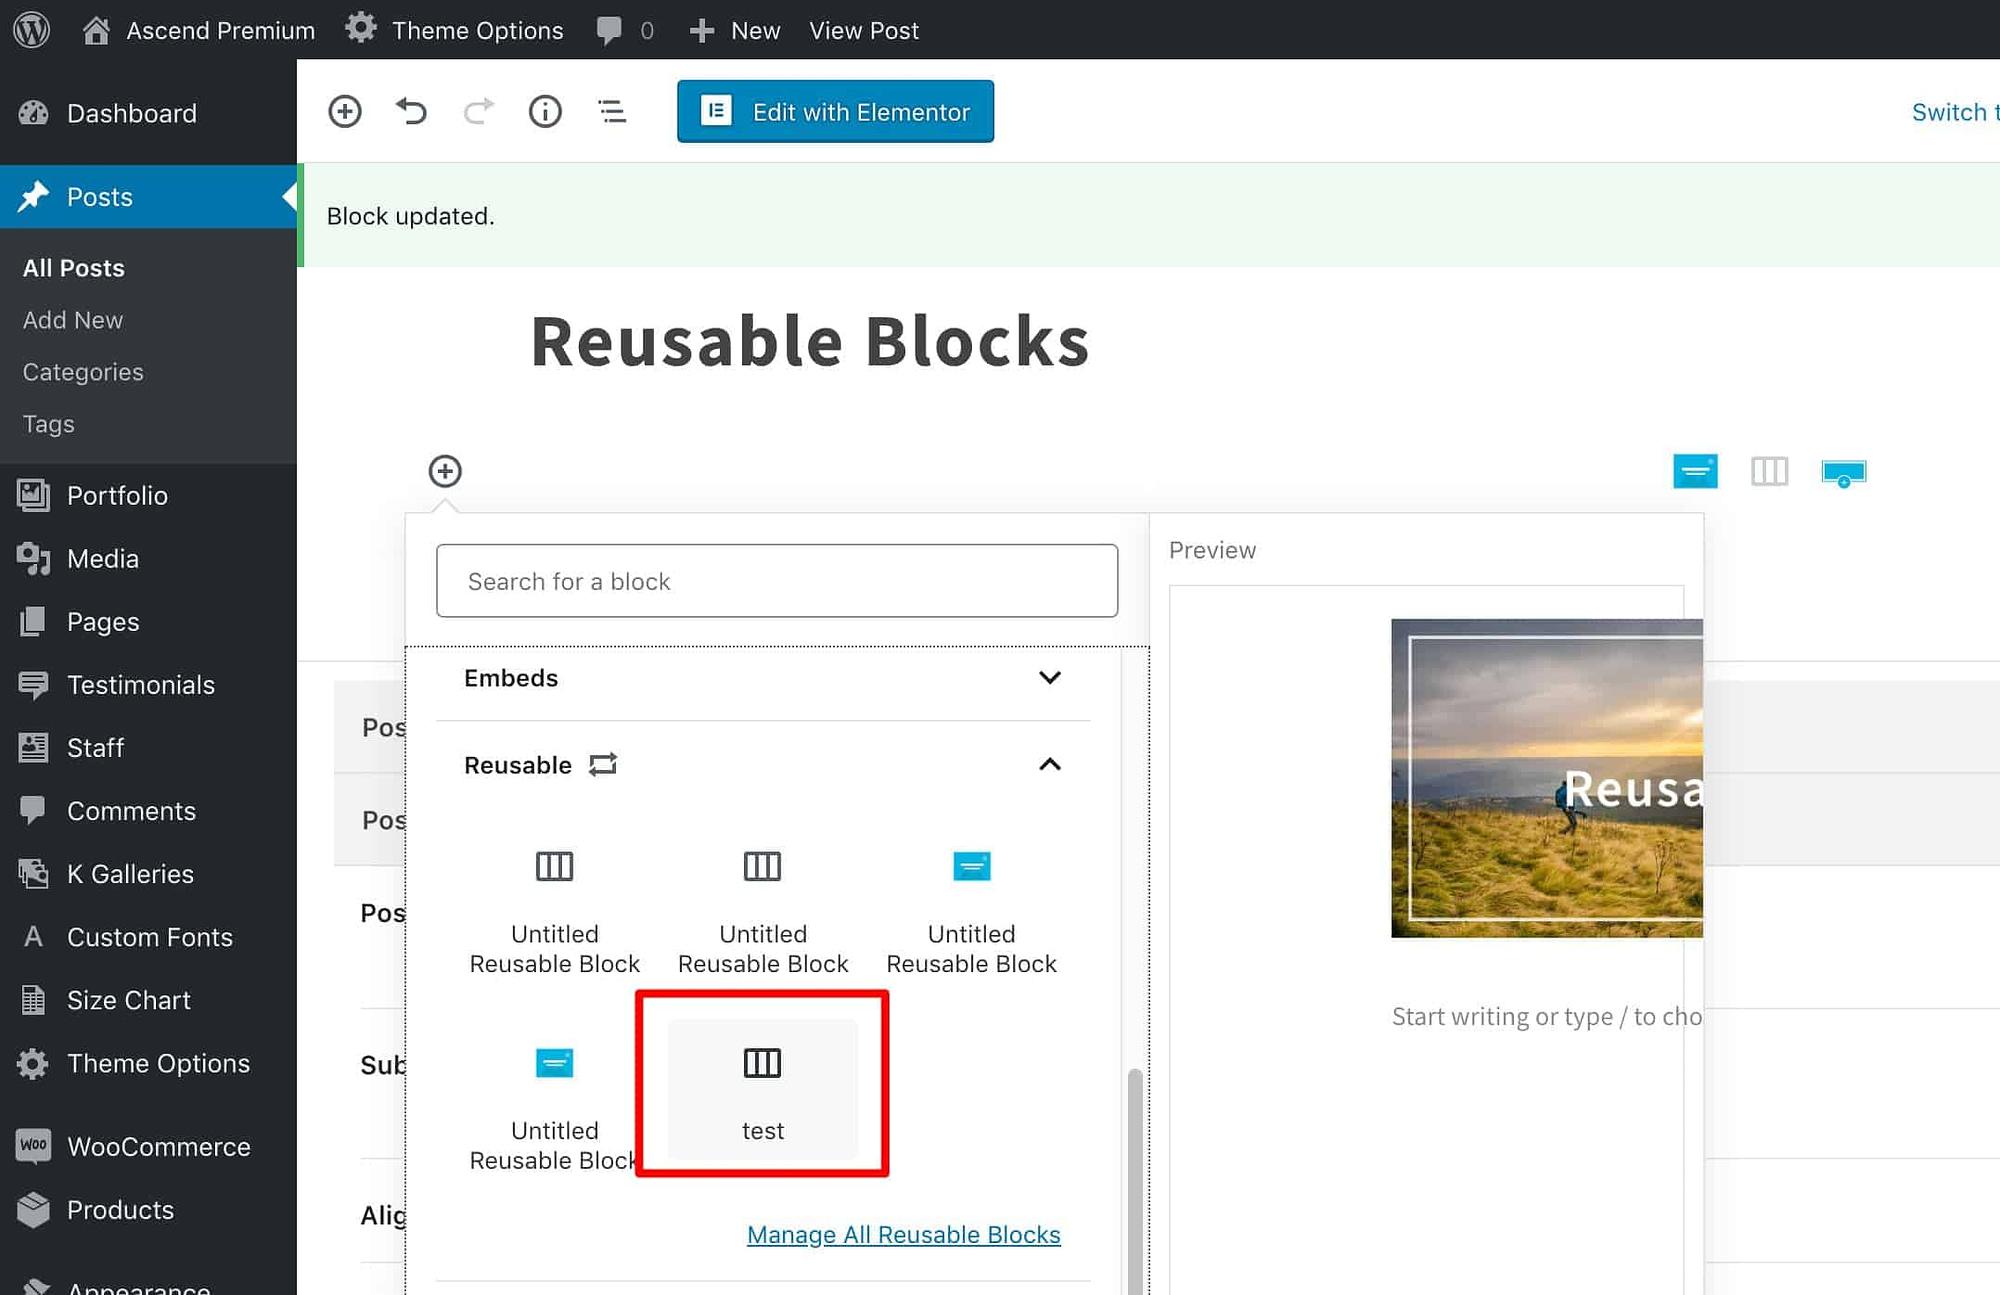 Access Reusable Block